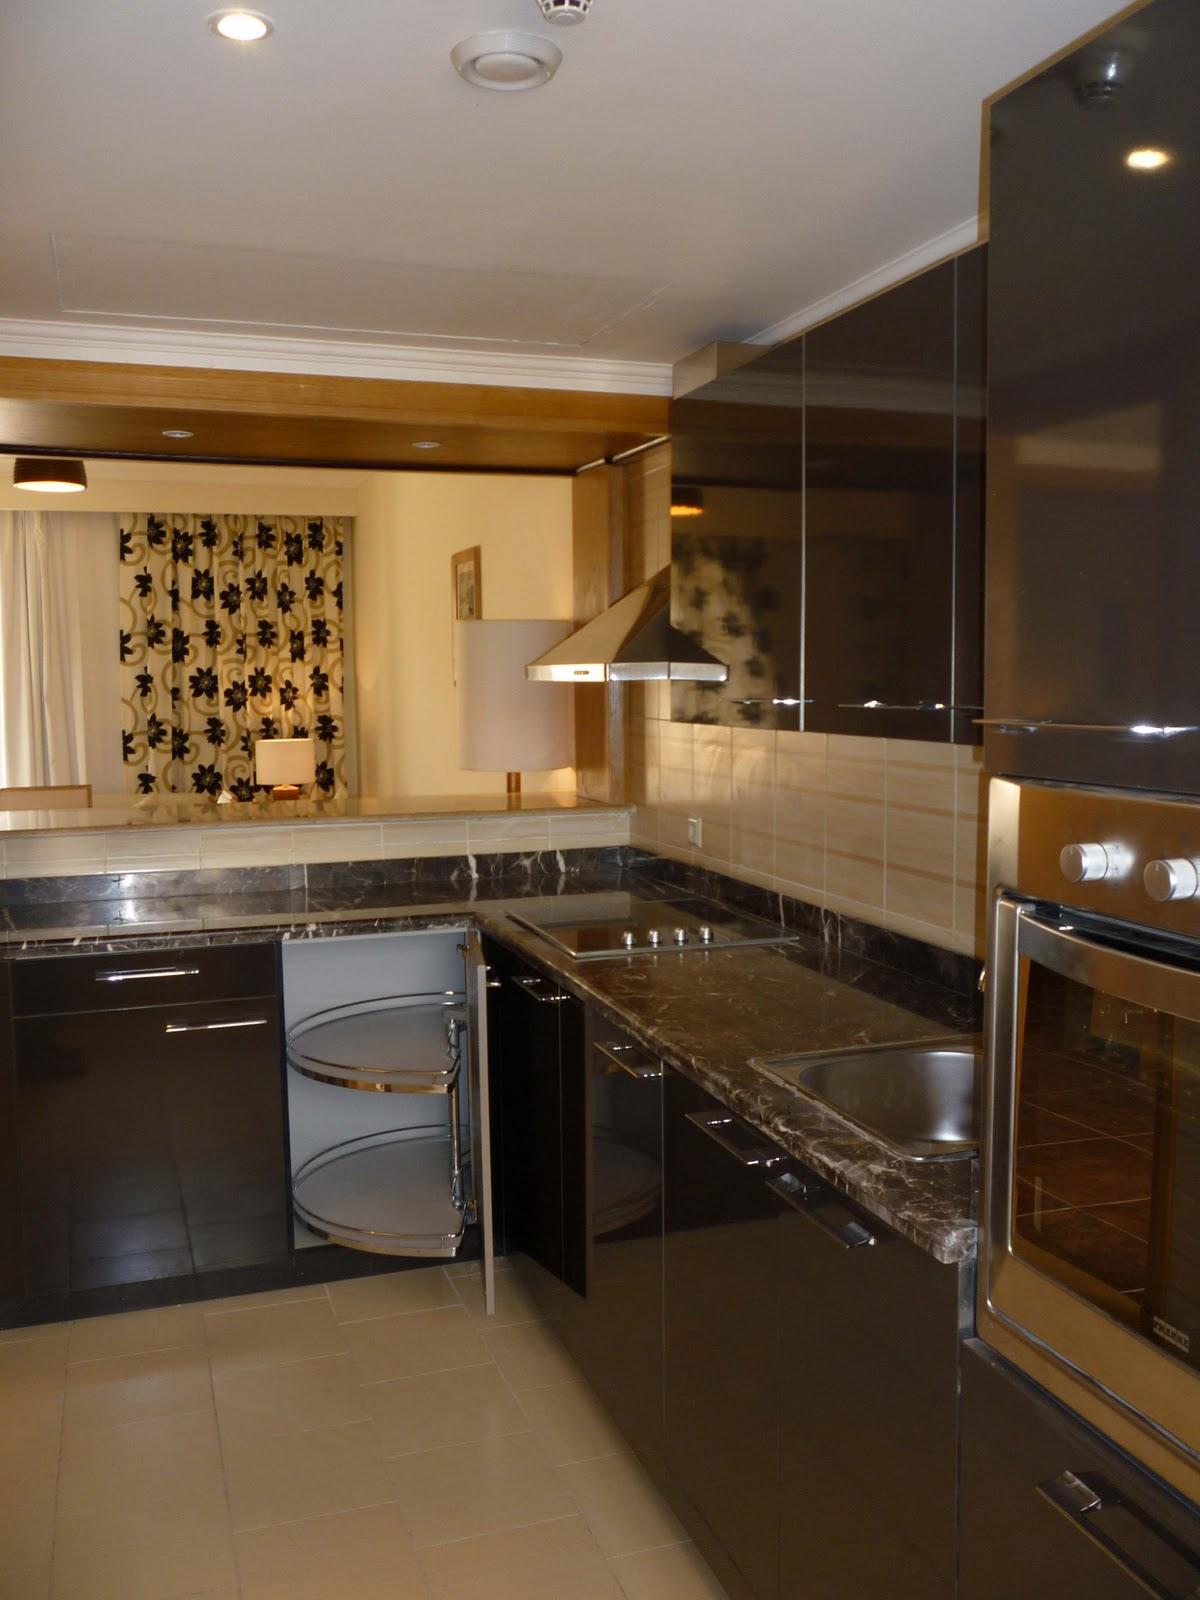 Pin mattonelle per cucine muratura febal prezzi on pinterest - Febal cucine prezzi ...